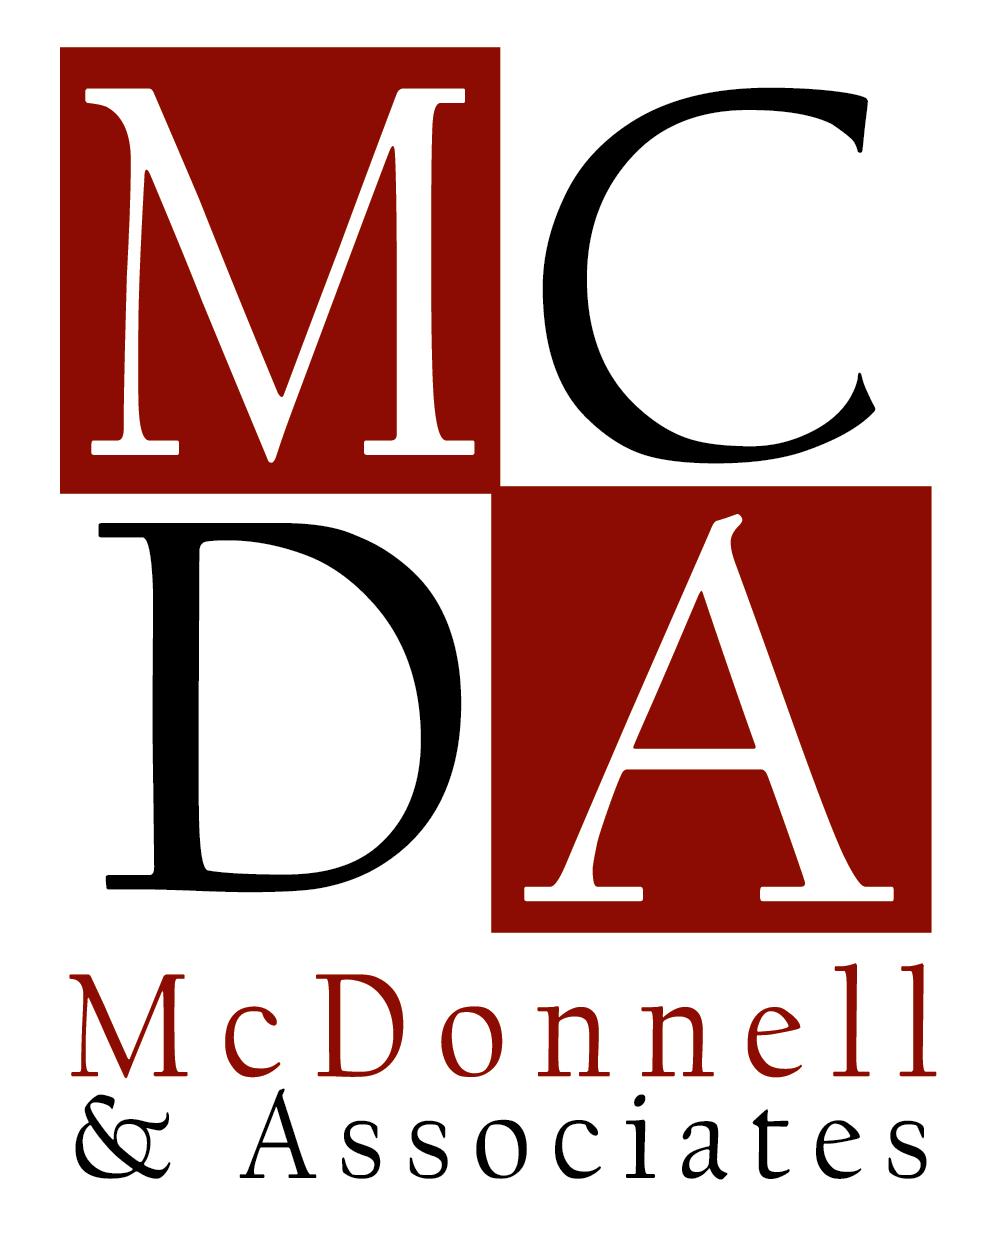 MCDA Law Firm